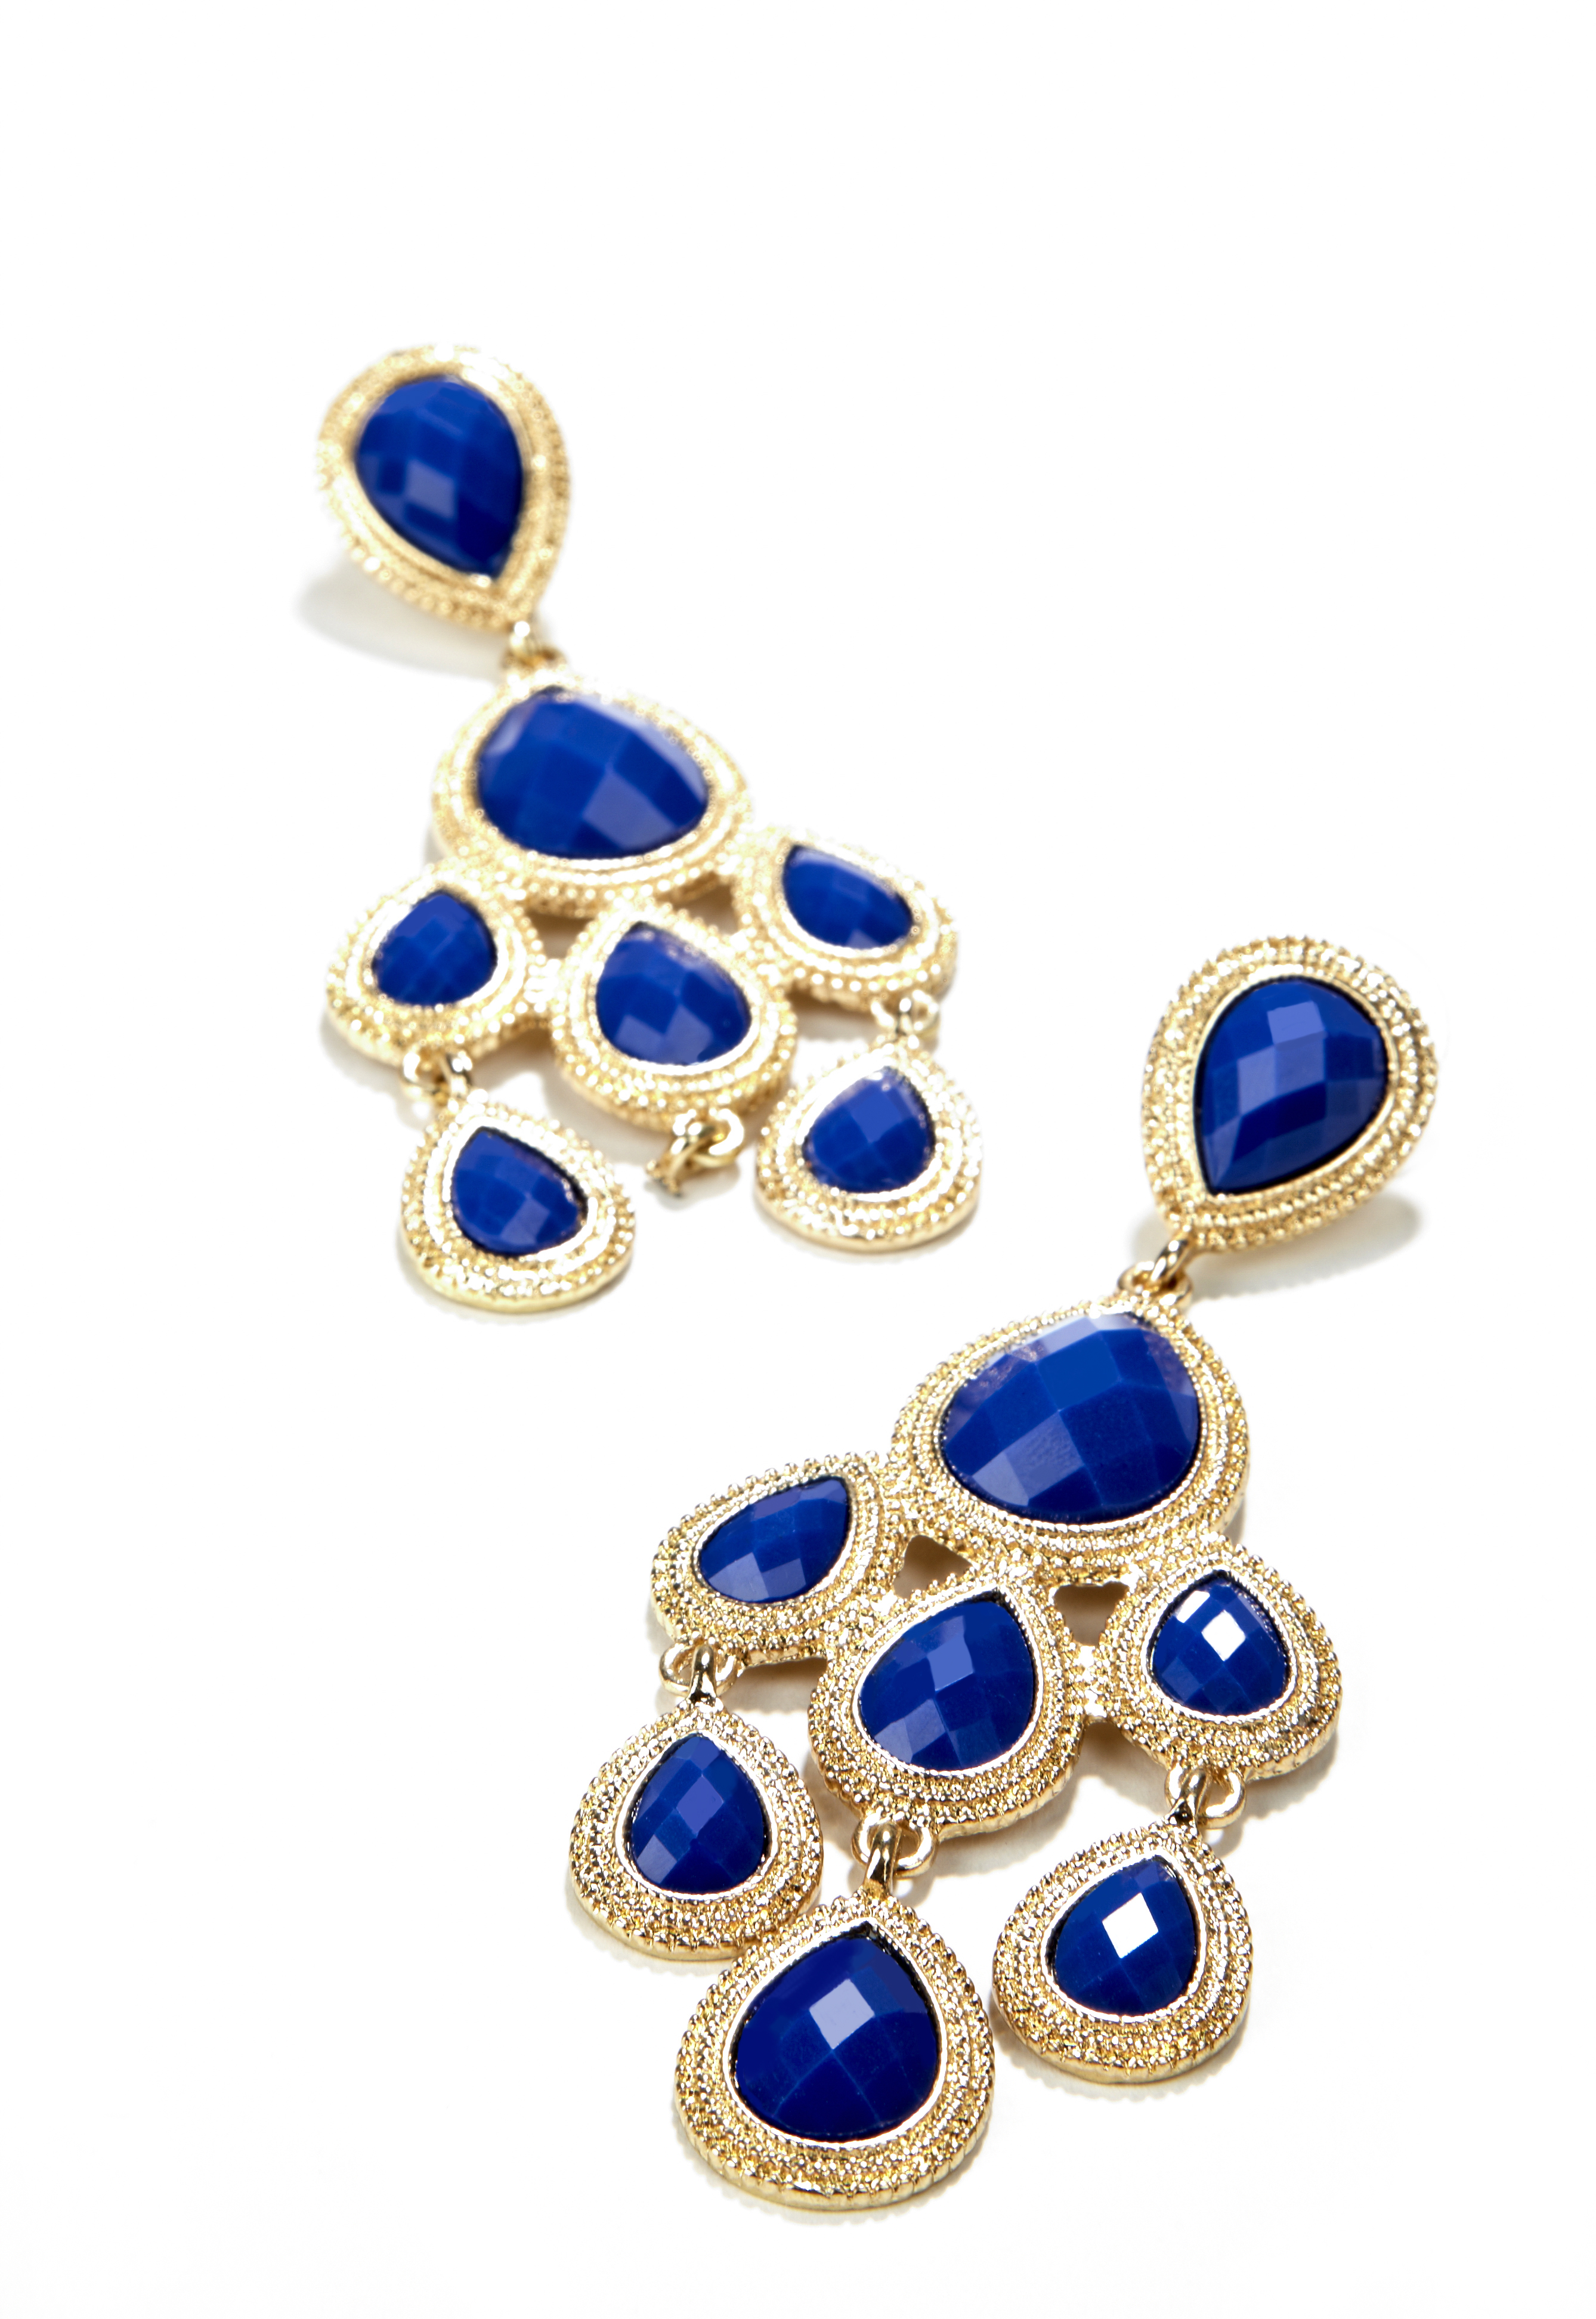 Azul cobalto y dorado en caravanas. Un detalle ideal para un outfit monocromático.